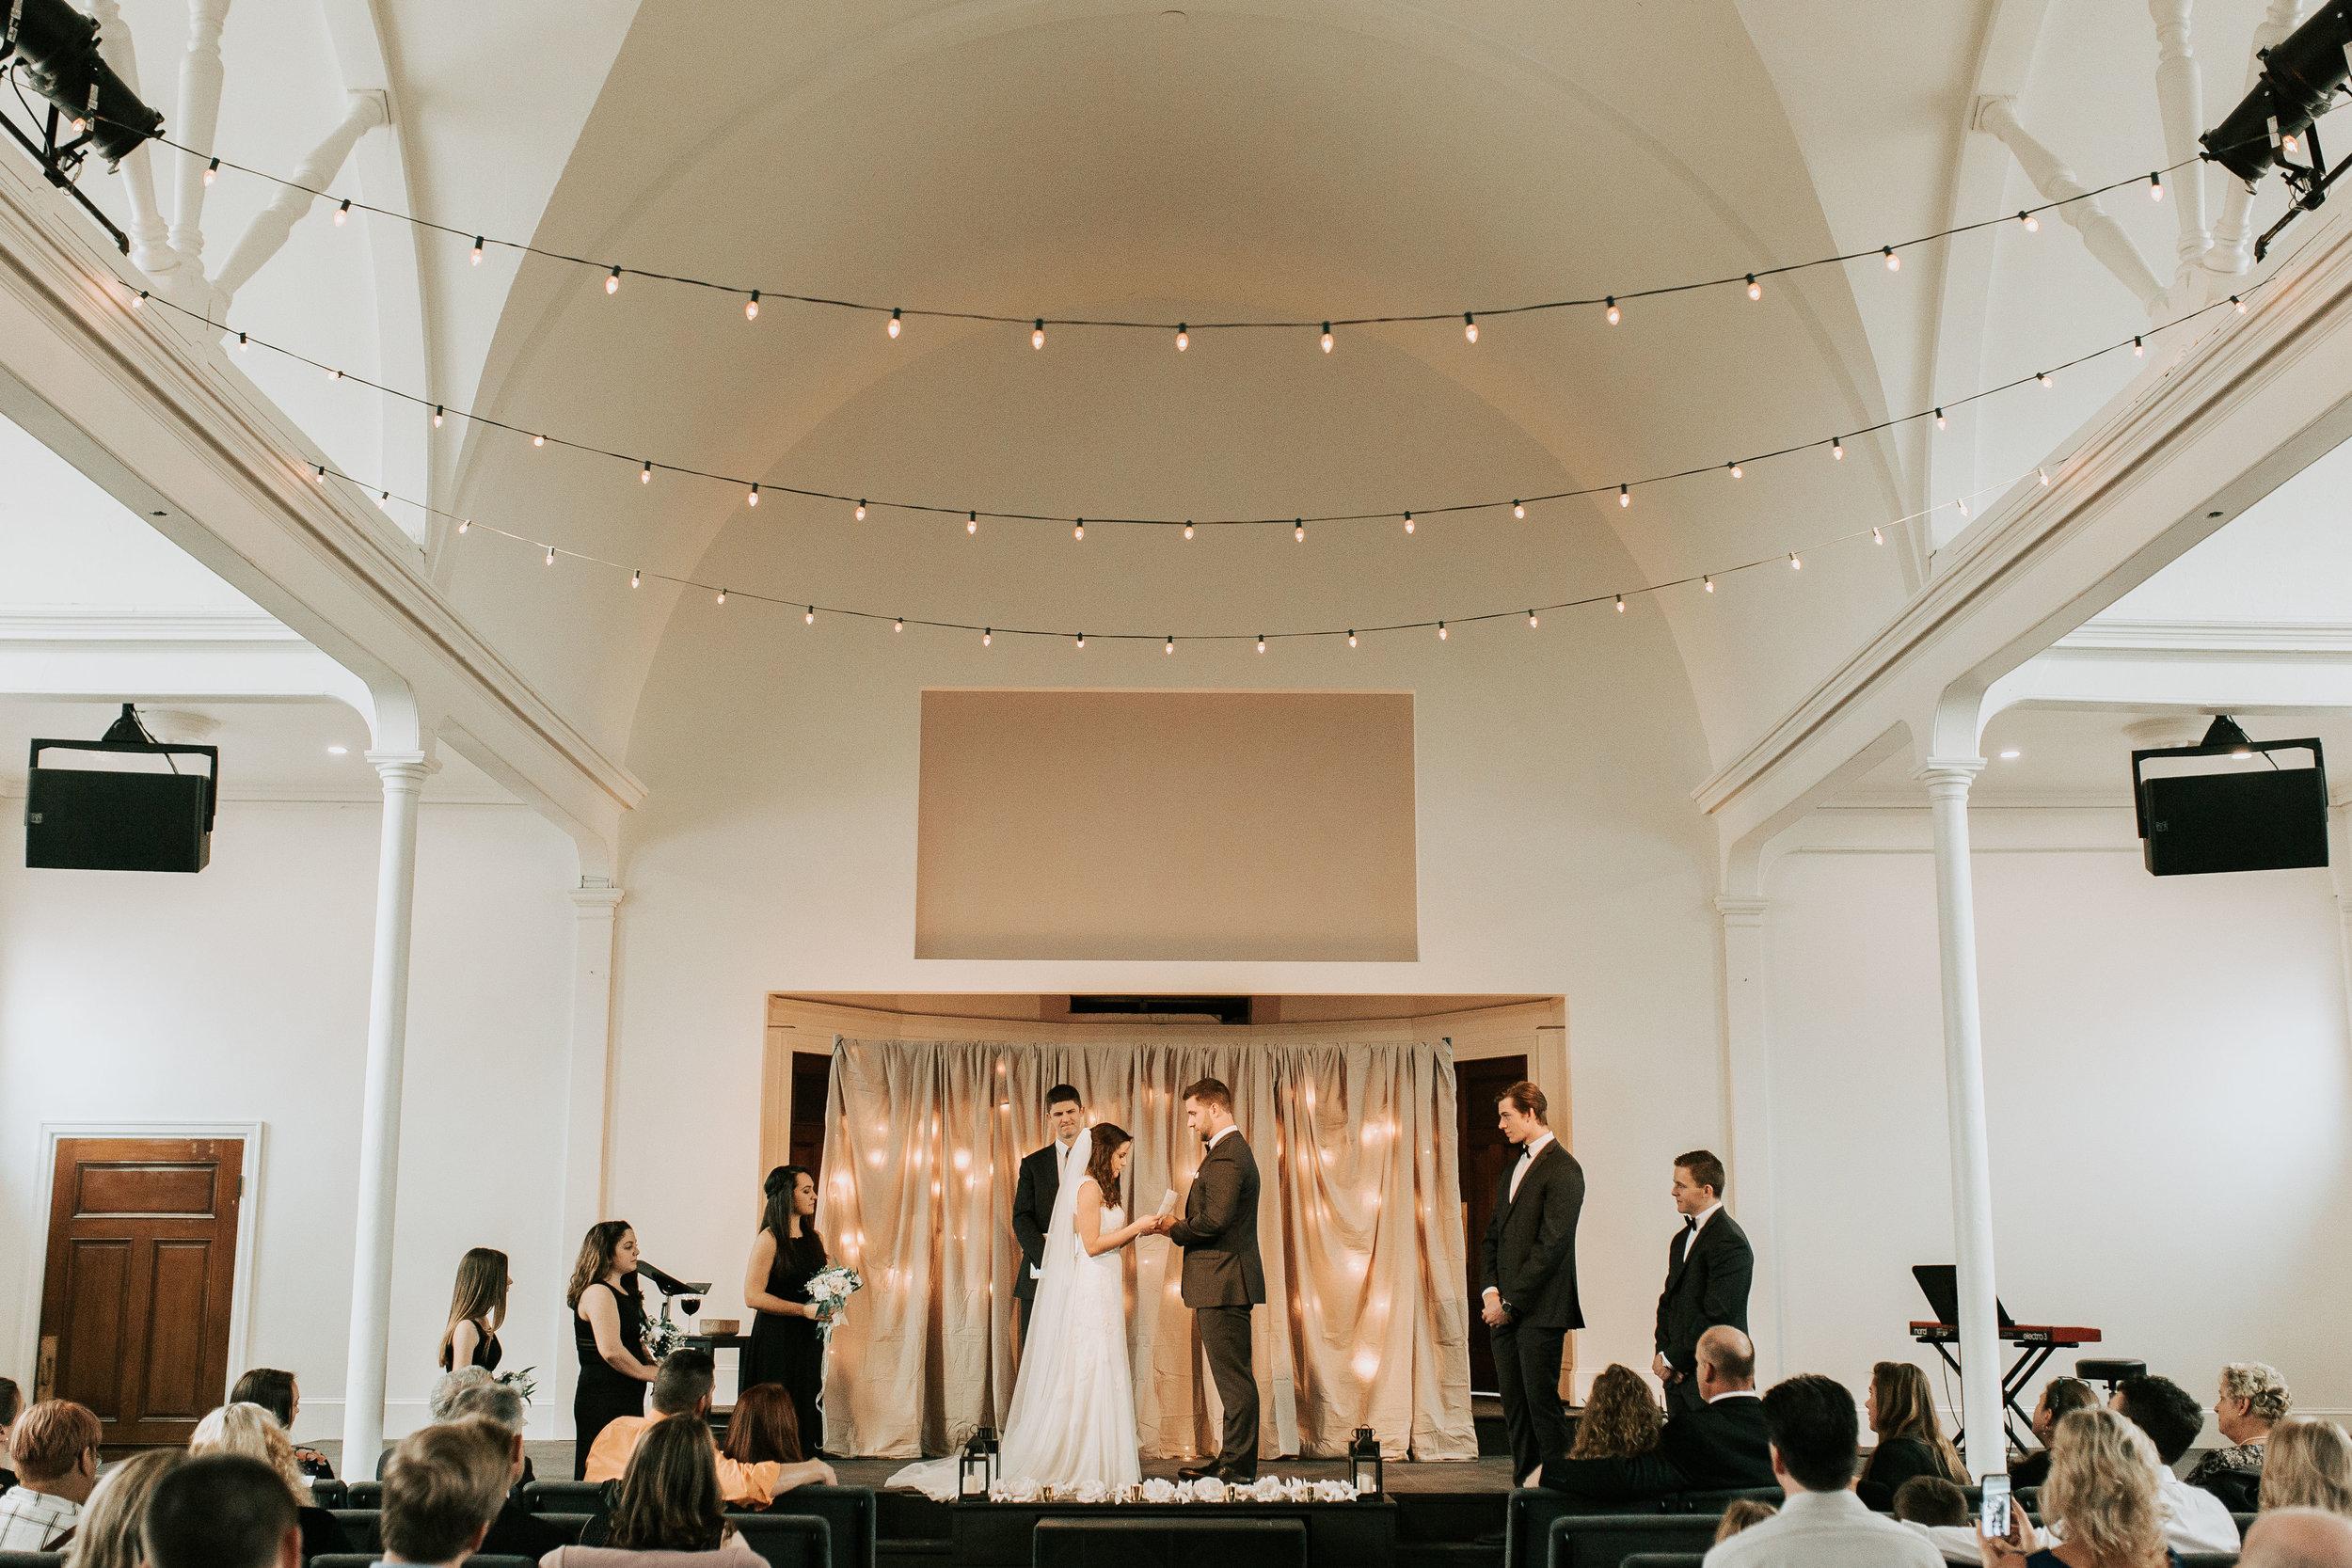 nicole-daacke-photography-boston-massachusetts-seaside-intimate-winter-wedding-photographer-12.jpg